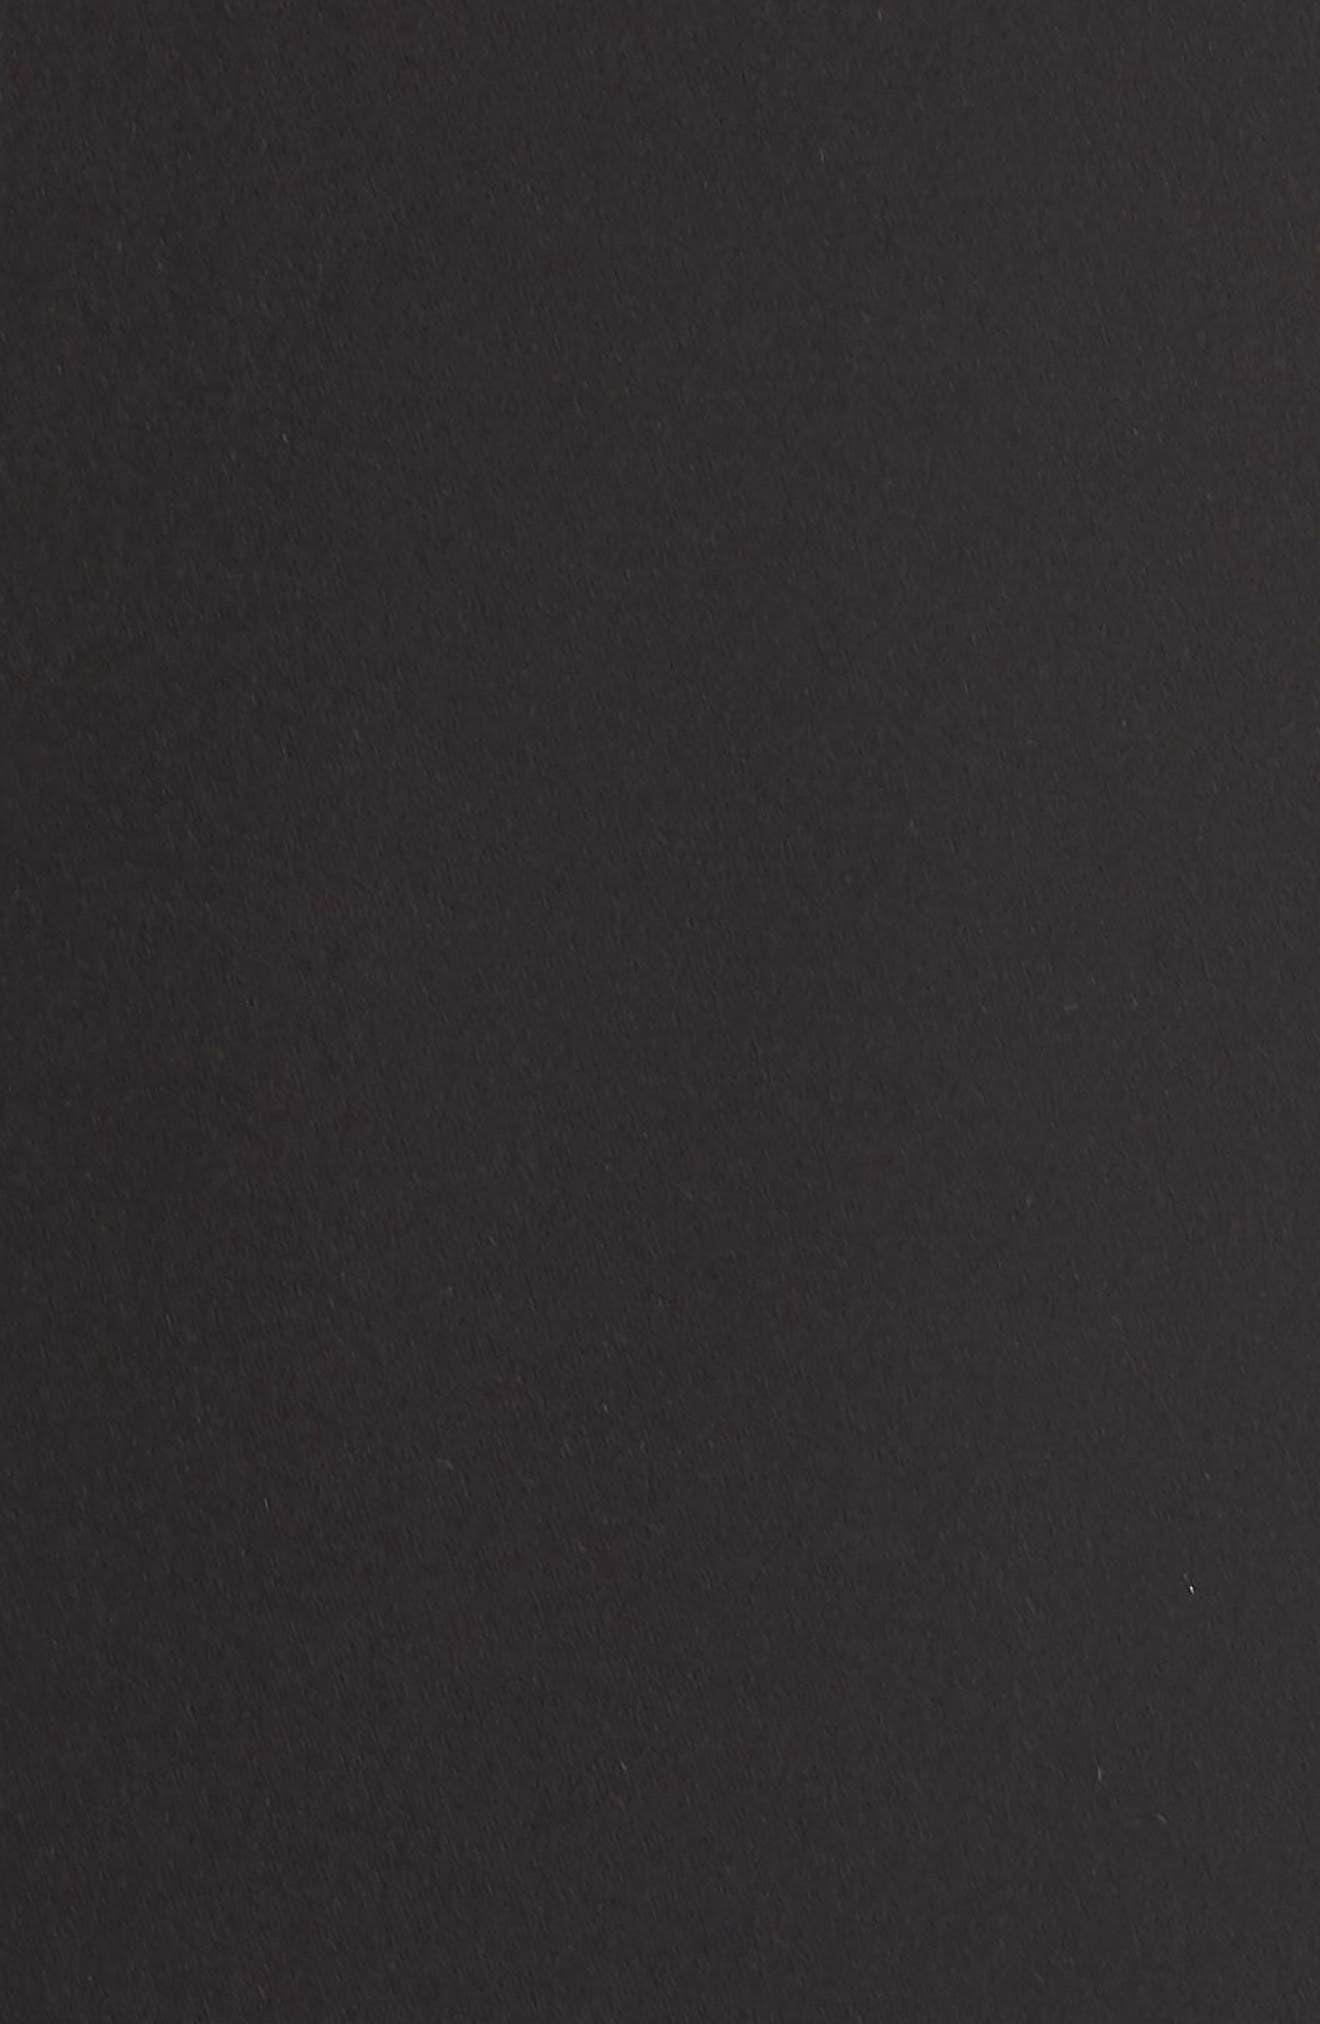 Bustier Ruffle Hem Dress,                             Alternate thumbnail 6, color,                             Black